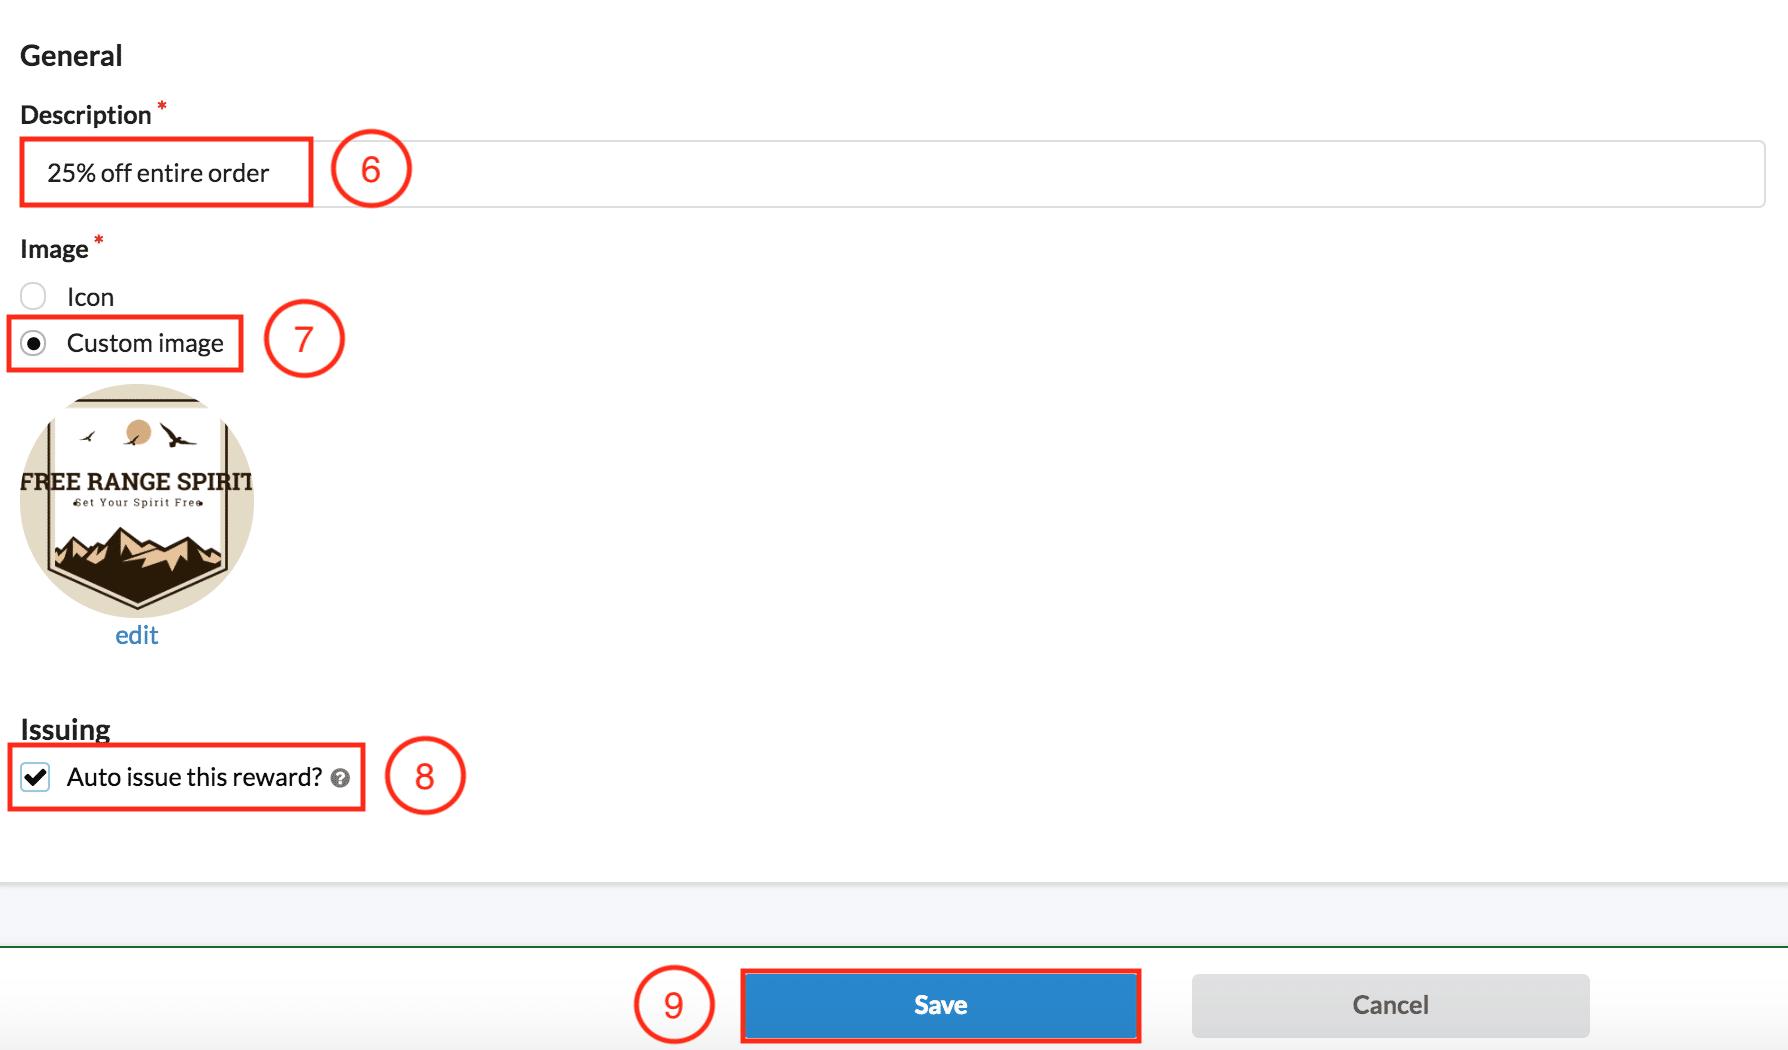 BrandChamp software rewards description image auto-issue